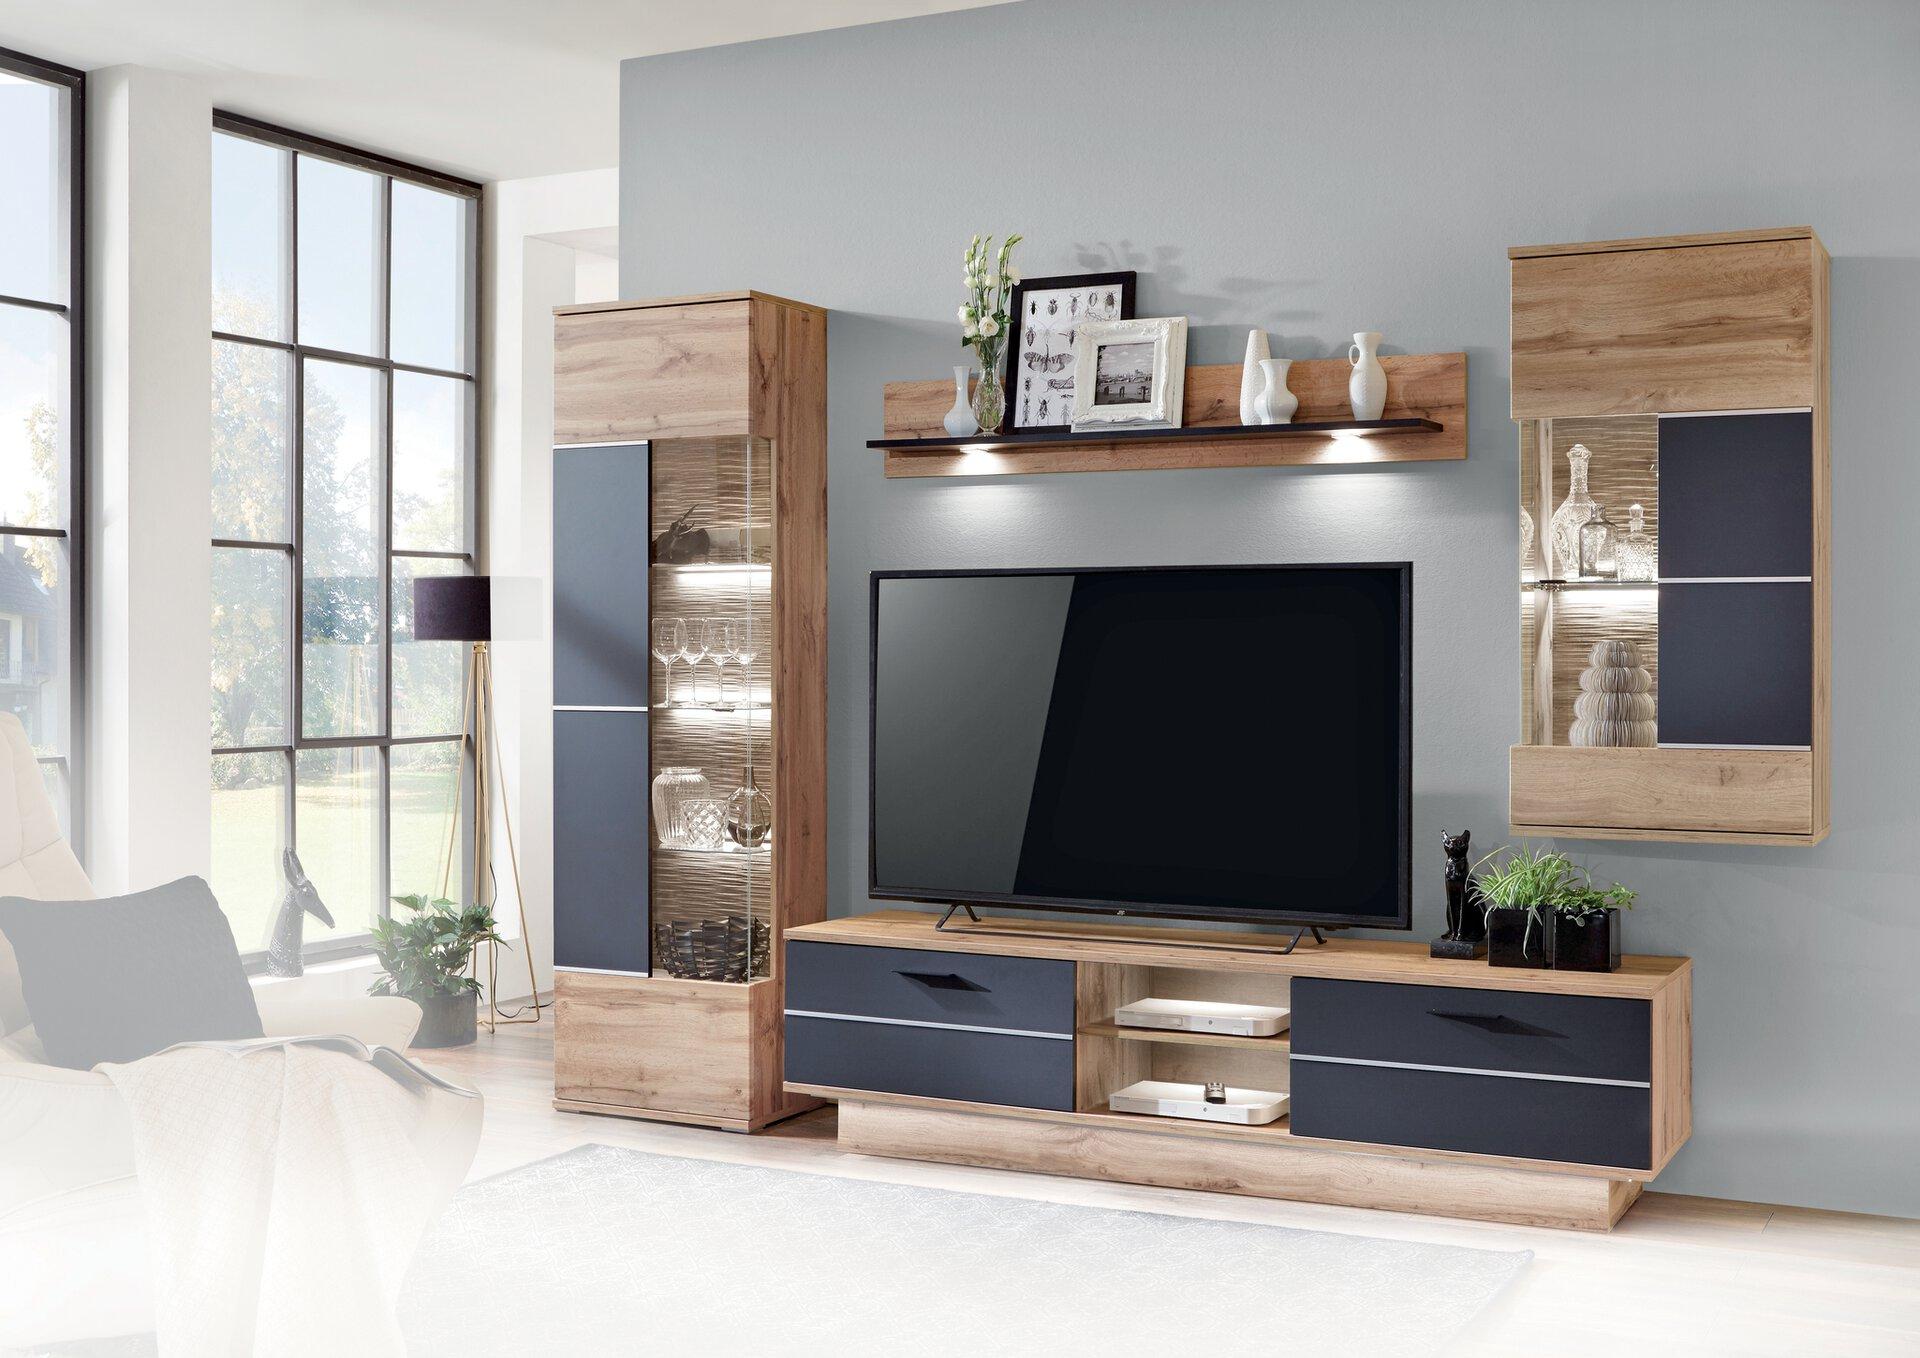 Wohnwand ALFONSO CELECT Holzwerkstoff weiß 50 x 207 x 300 cm